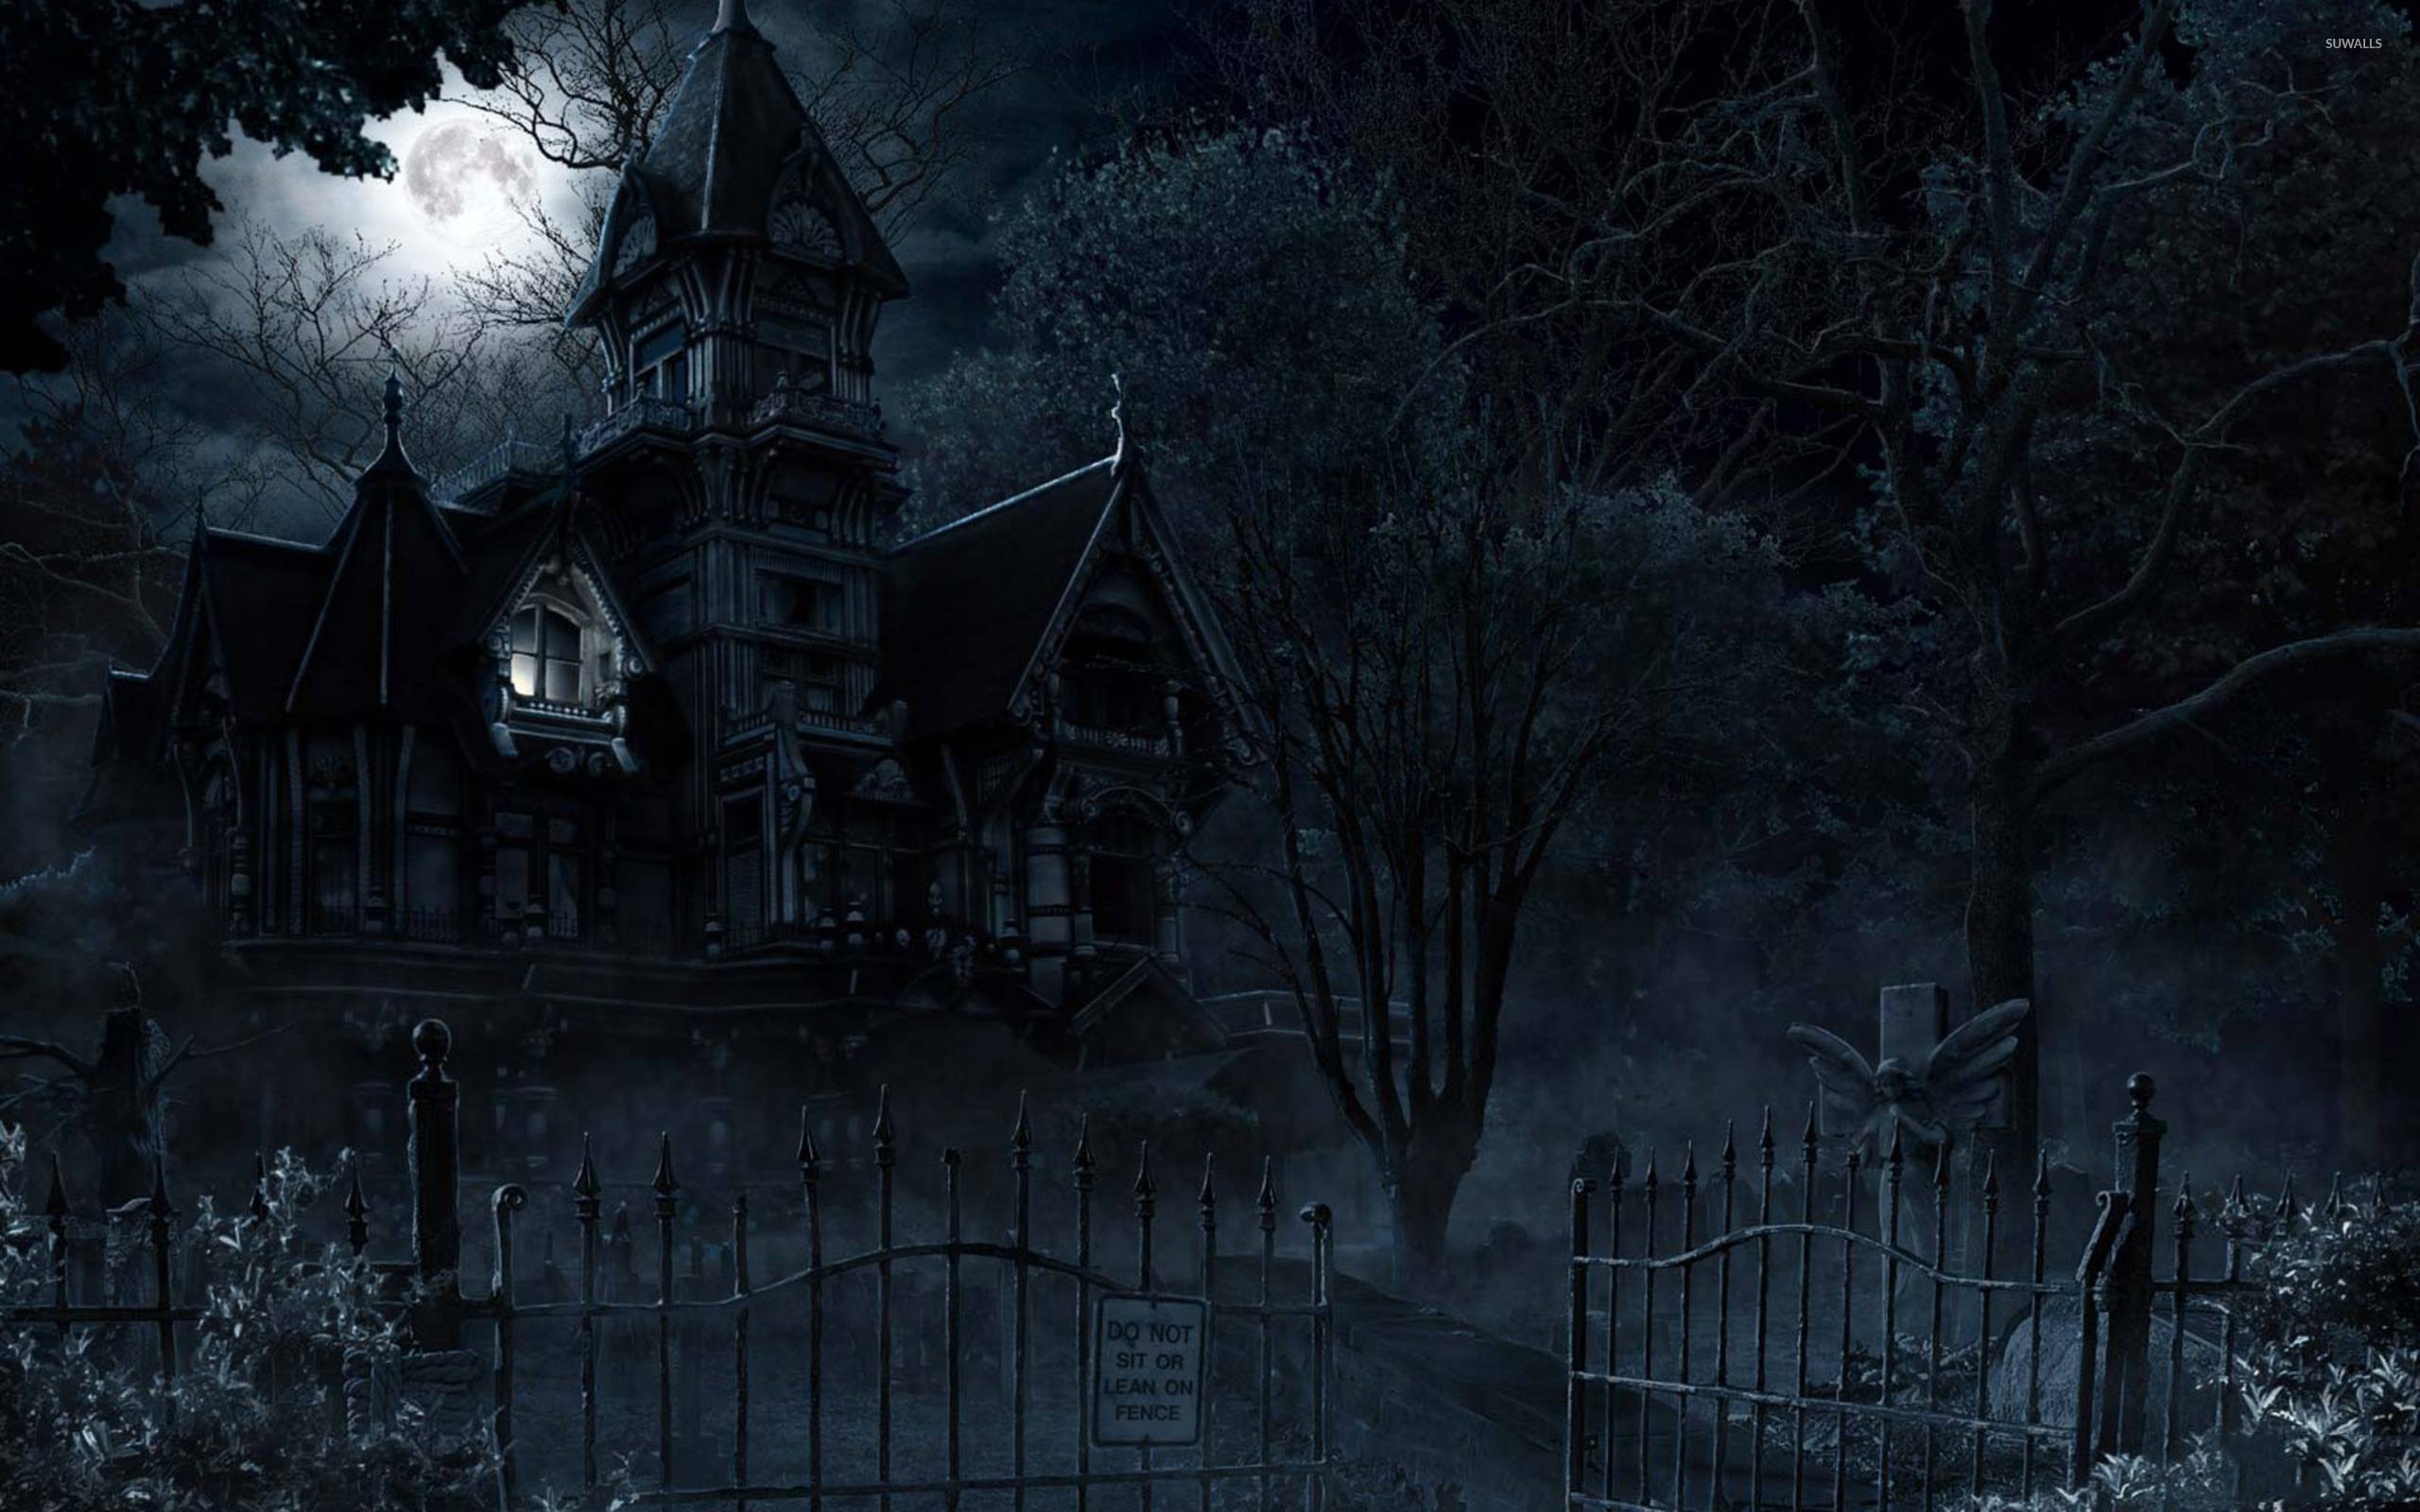 Haunted mansion in the full moon wallpaper jpg